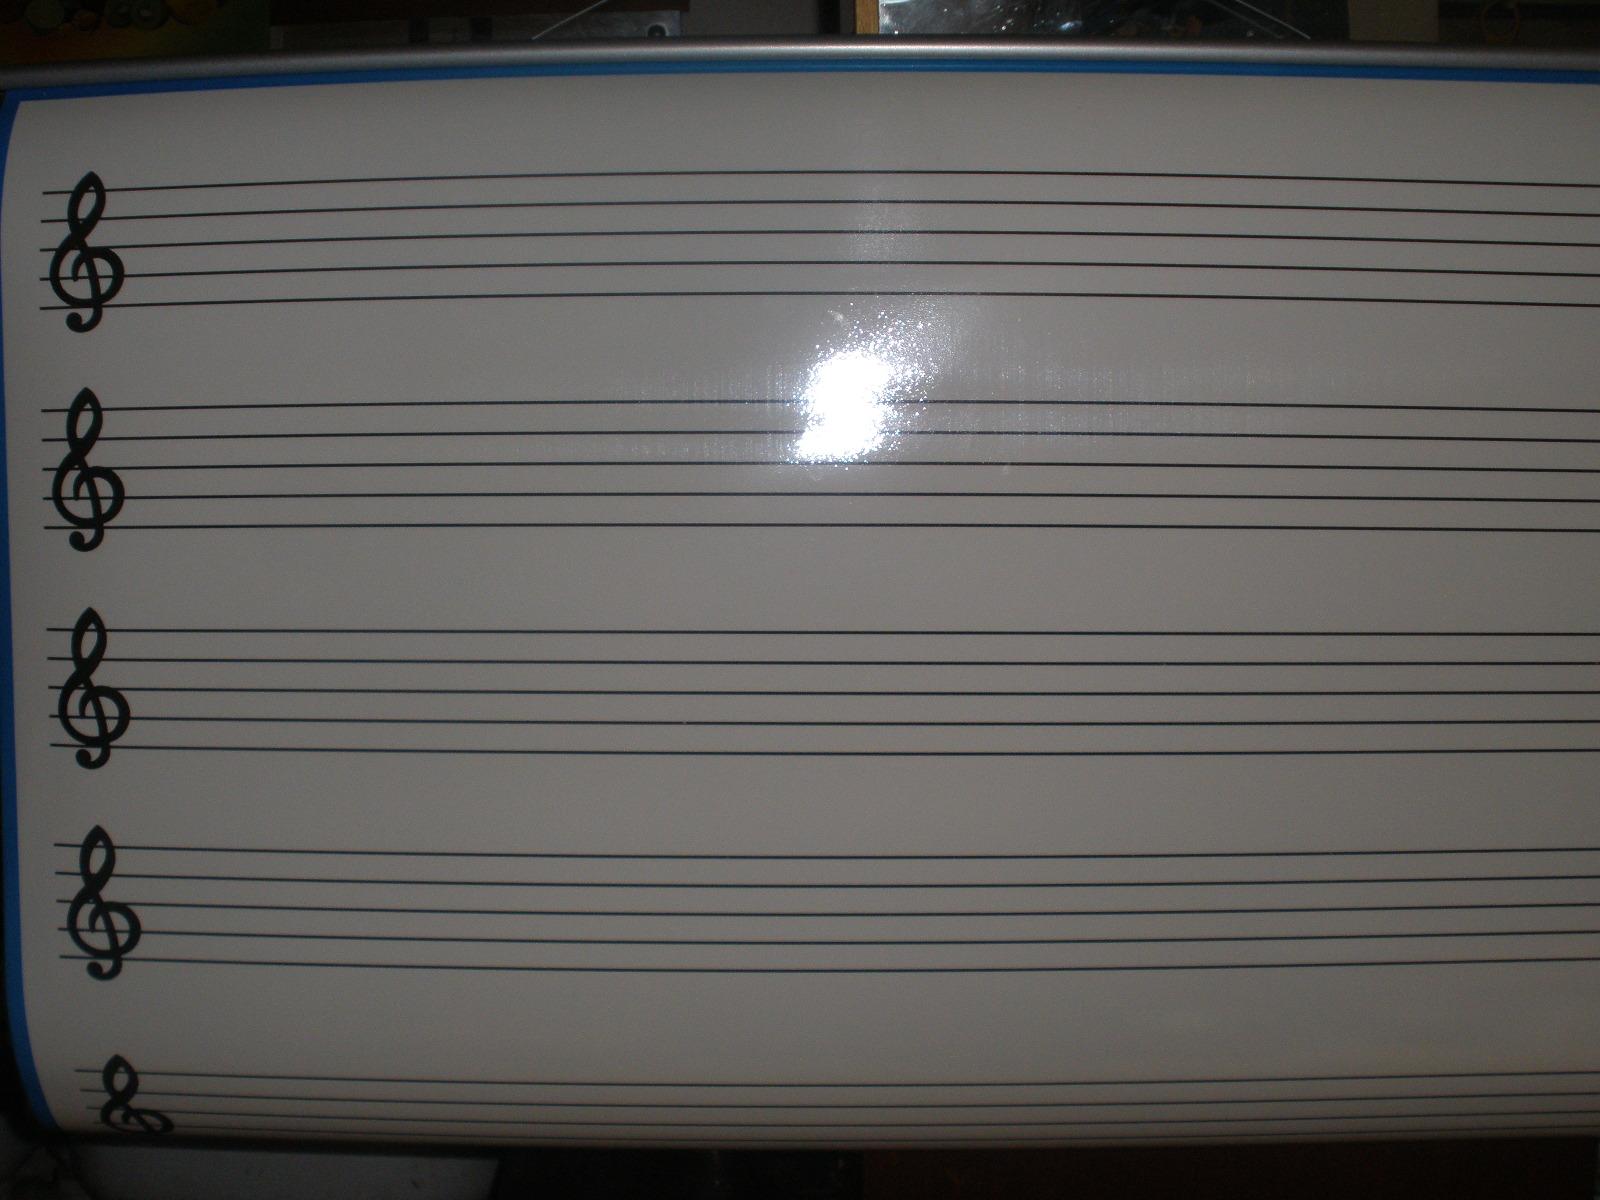 Biela notová tabuľa 100 x 75 cm,